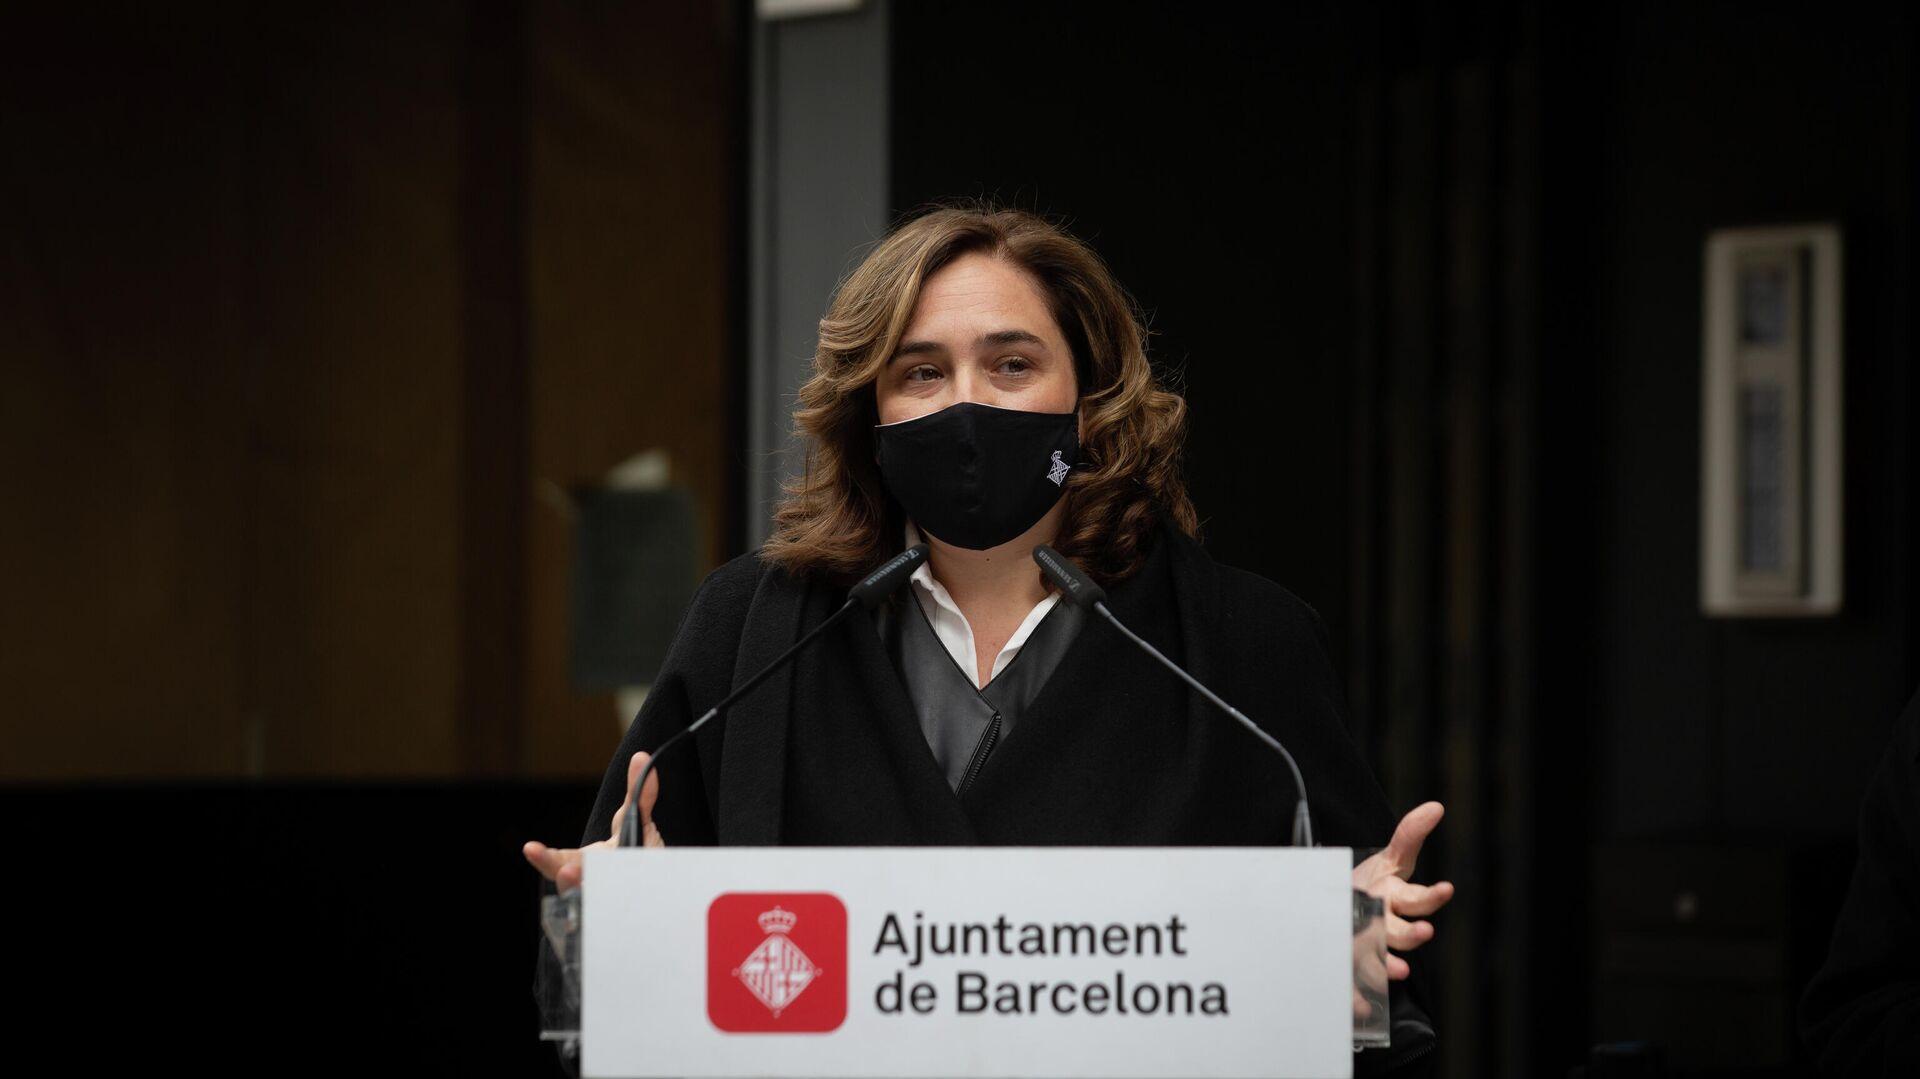 La alcaldesa de Barcelona, Ada Colau - Sputnik Mundo, 1920, 06.09.2021